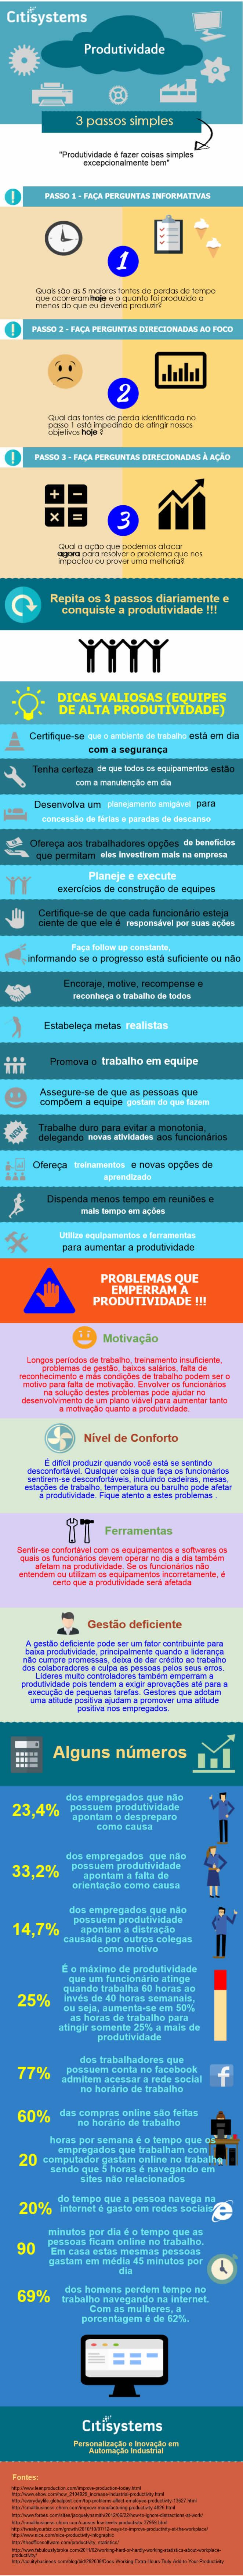 produtividade infografico produtividade infografico 1